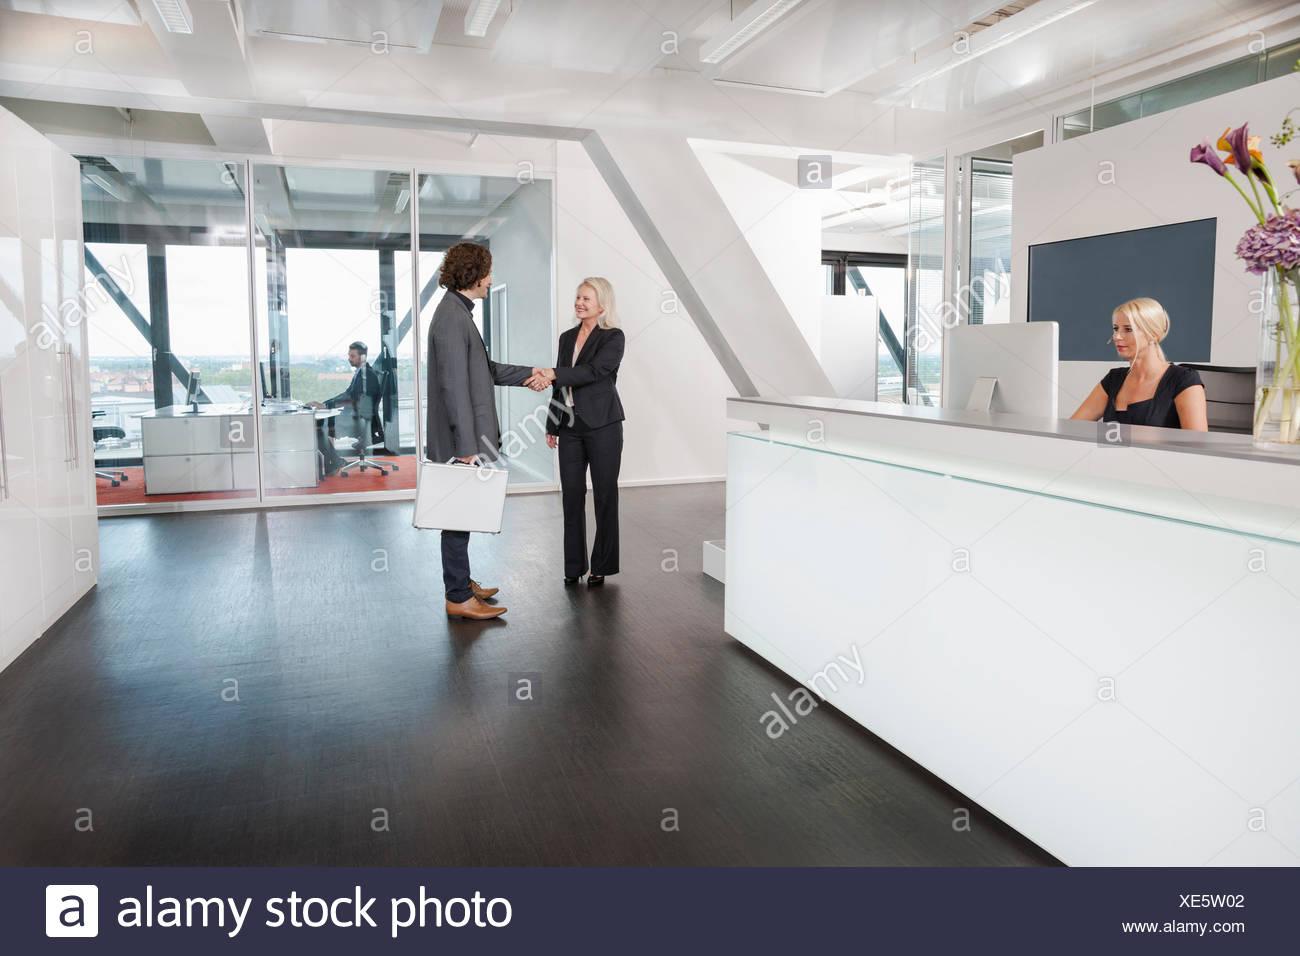 Frau Händeschütteln mit Besucher an der Rezeption Stockbild